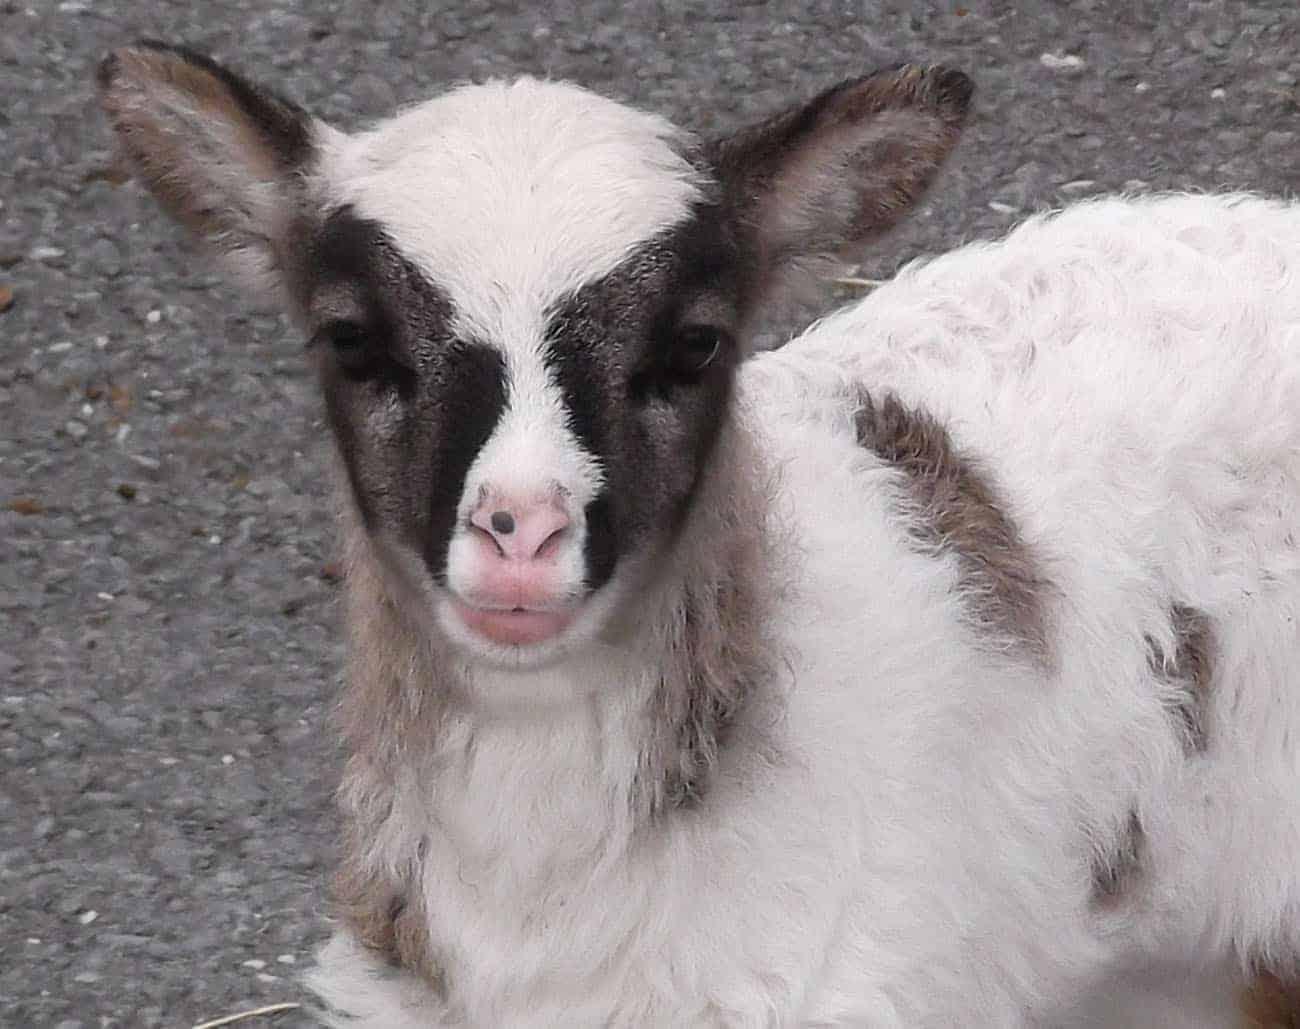 patchwork sheep soay cross shetland spotted ewe Fern lamb cute